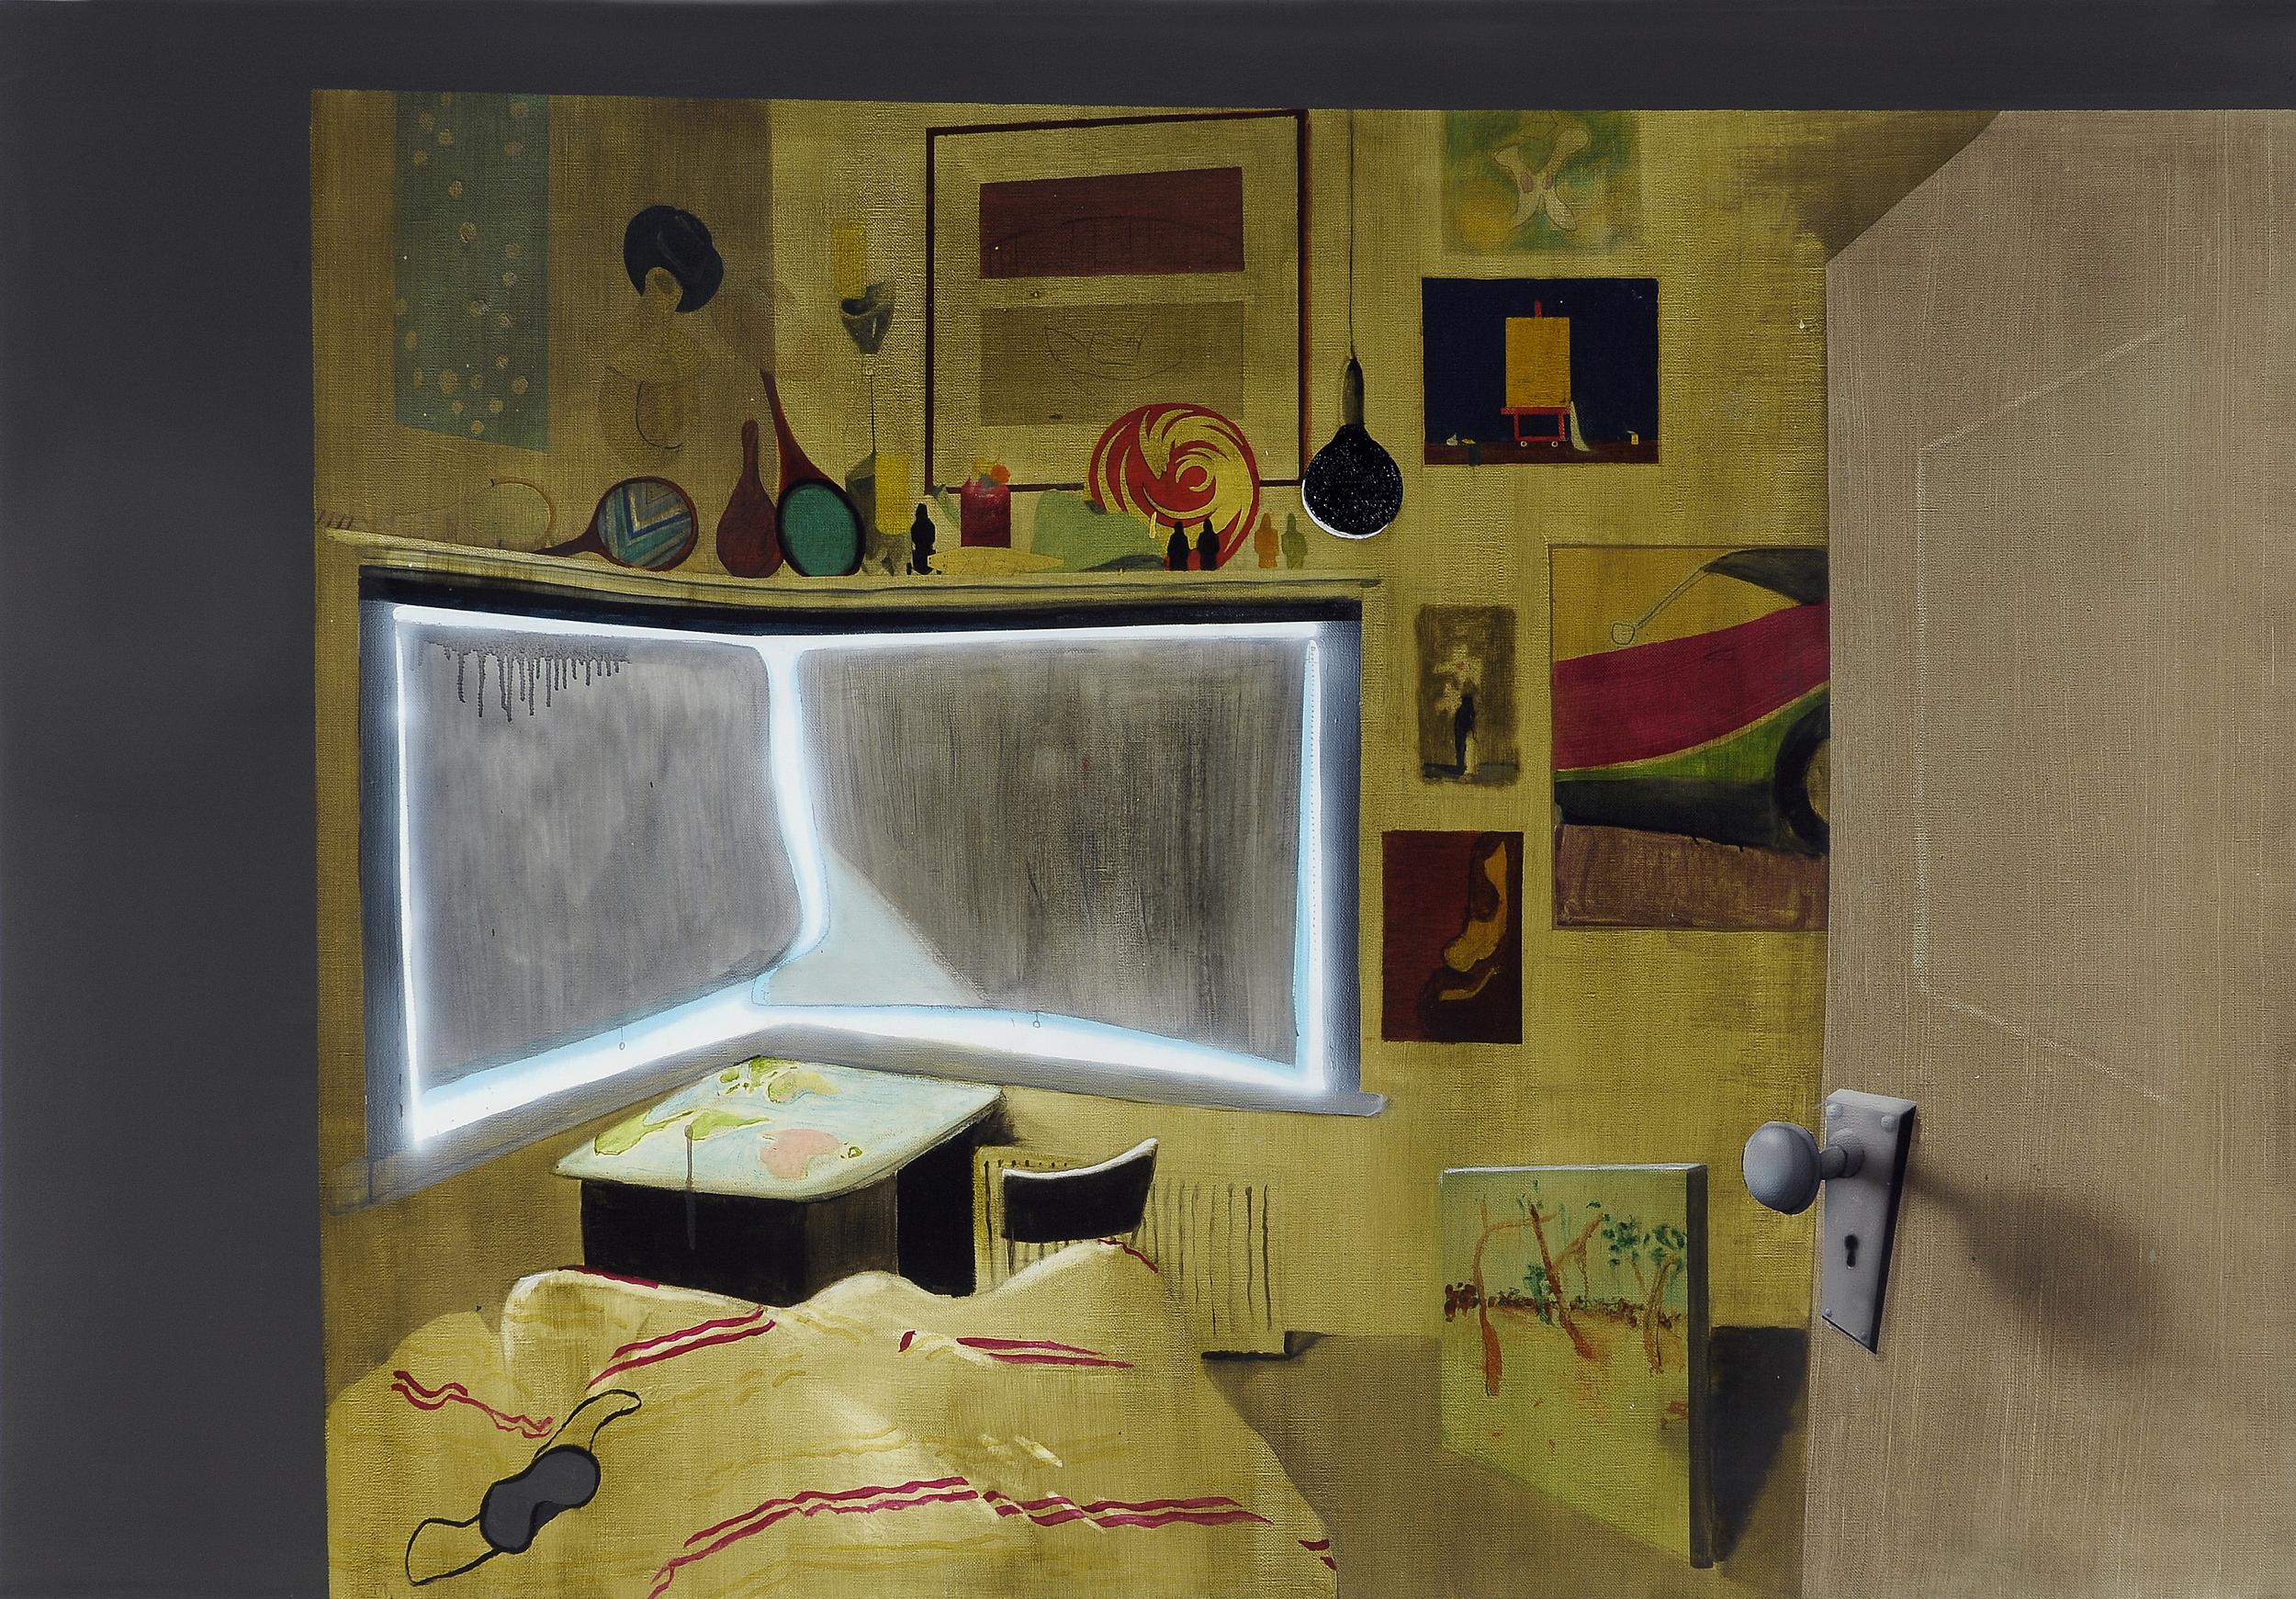 Cavepainting,  2008 Acrylic, oil and enamel on linen 120 x 200cm